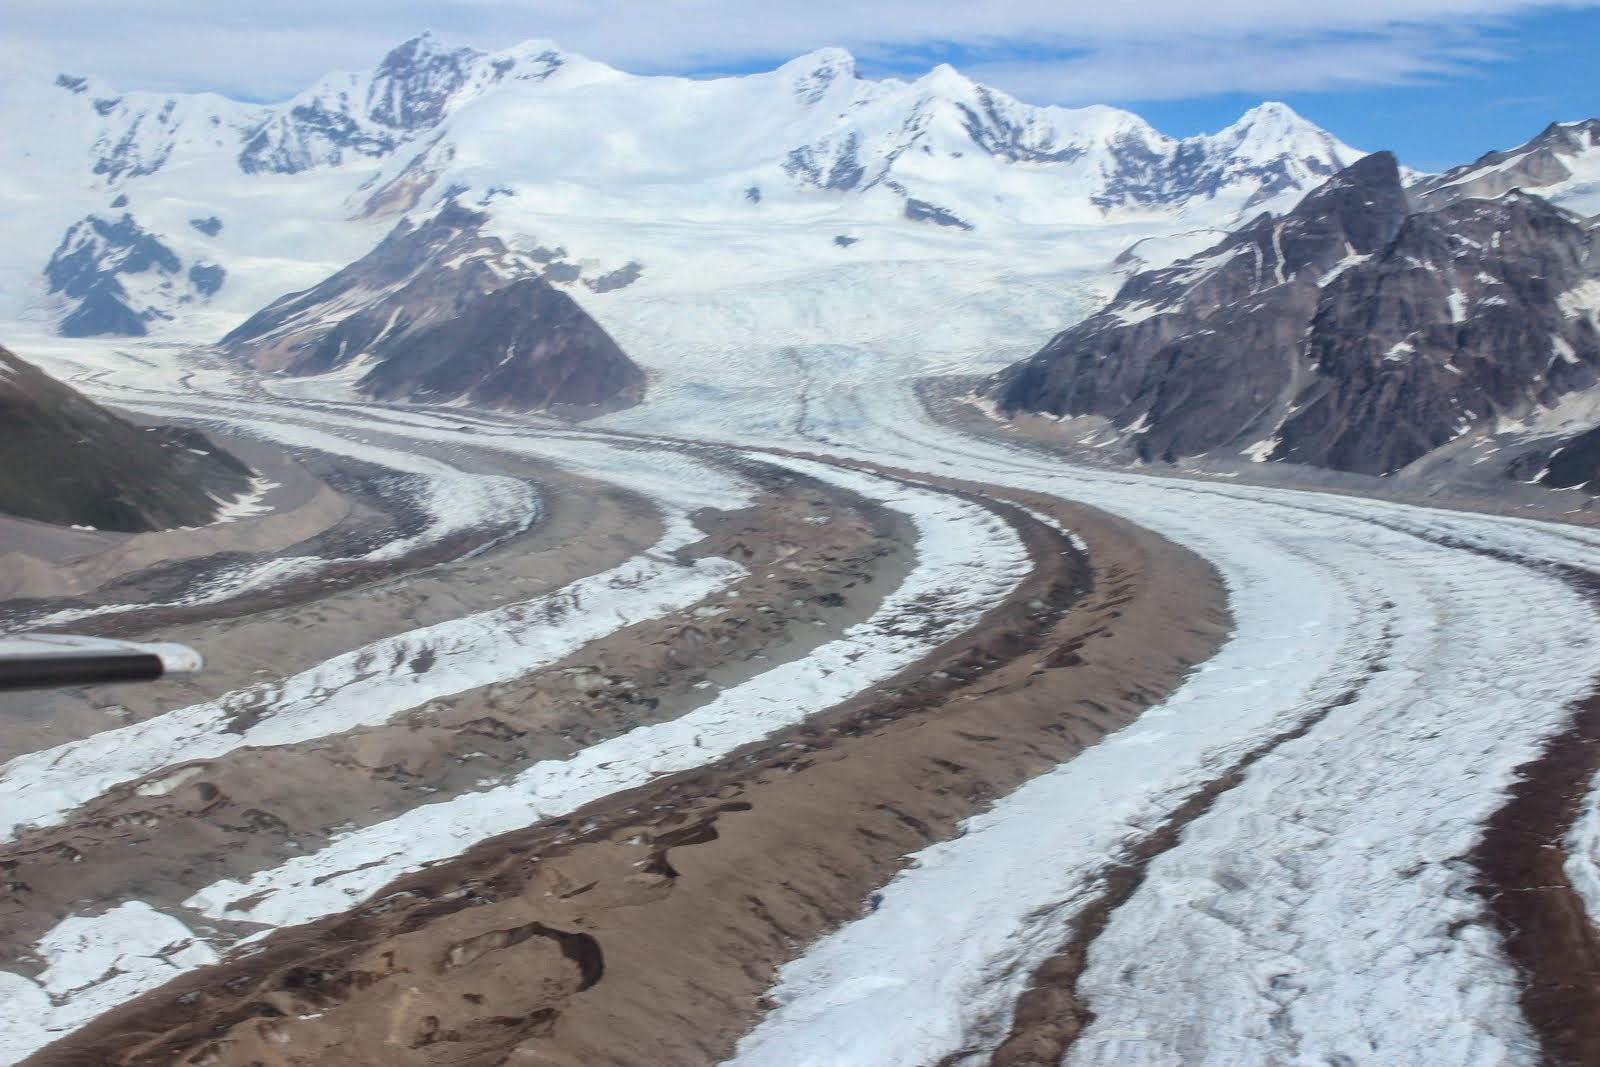 Bearfoot Alaska Nature Trail: Alaska's Mountains, Rivers, Volcanoes, Glaciers...